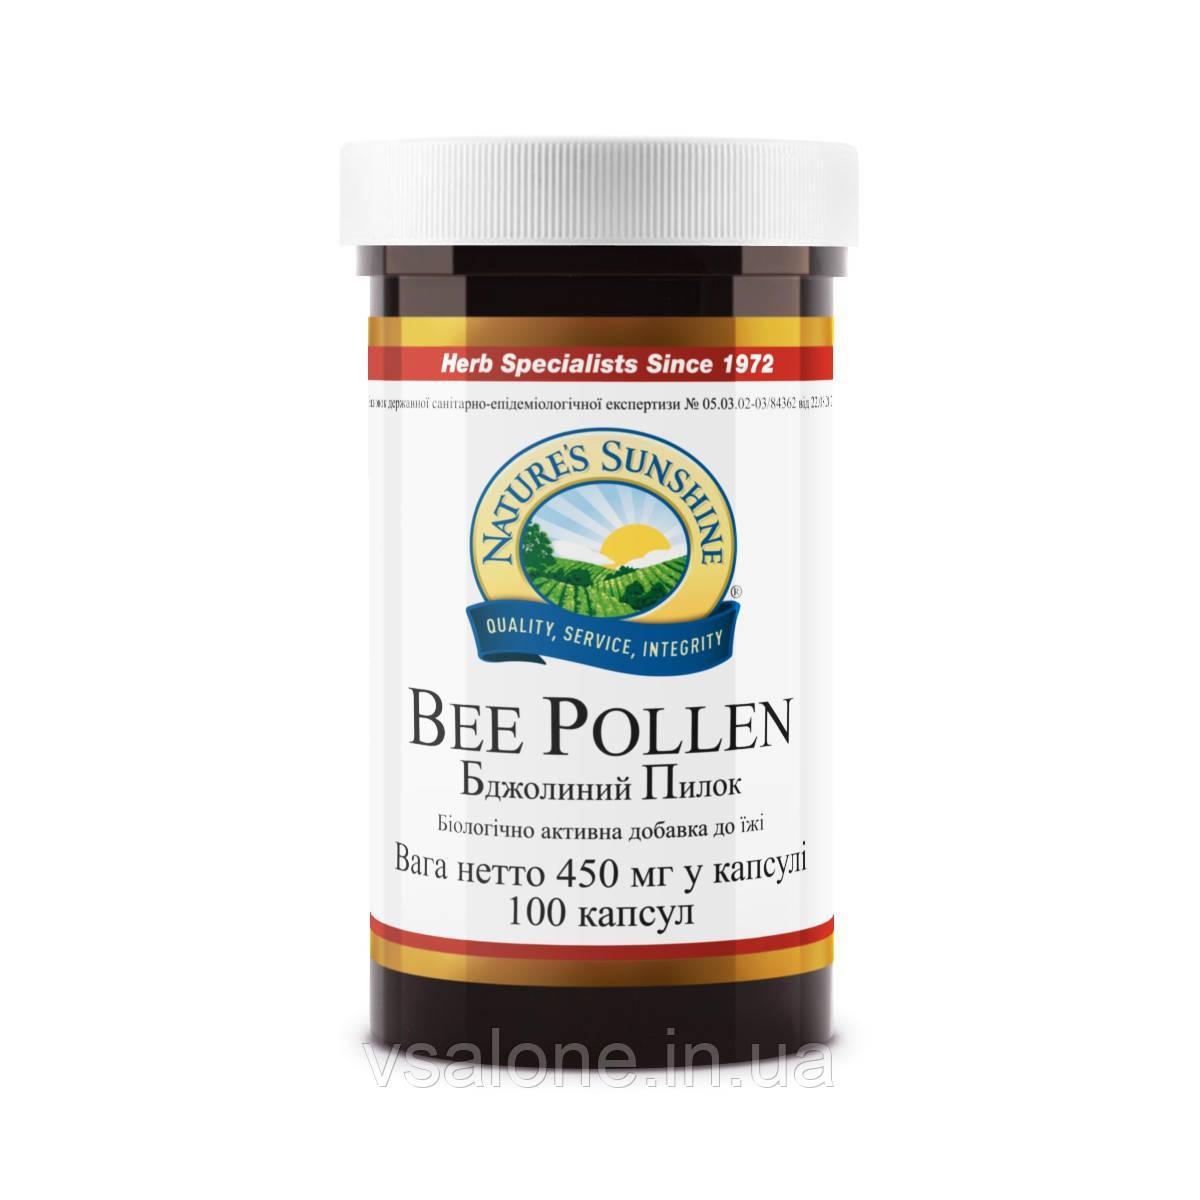 Пчелиная пыльца Bee Pollen